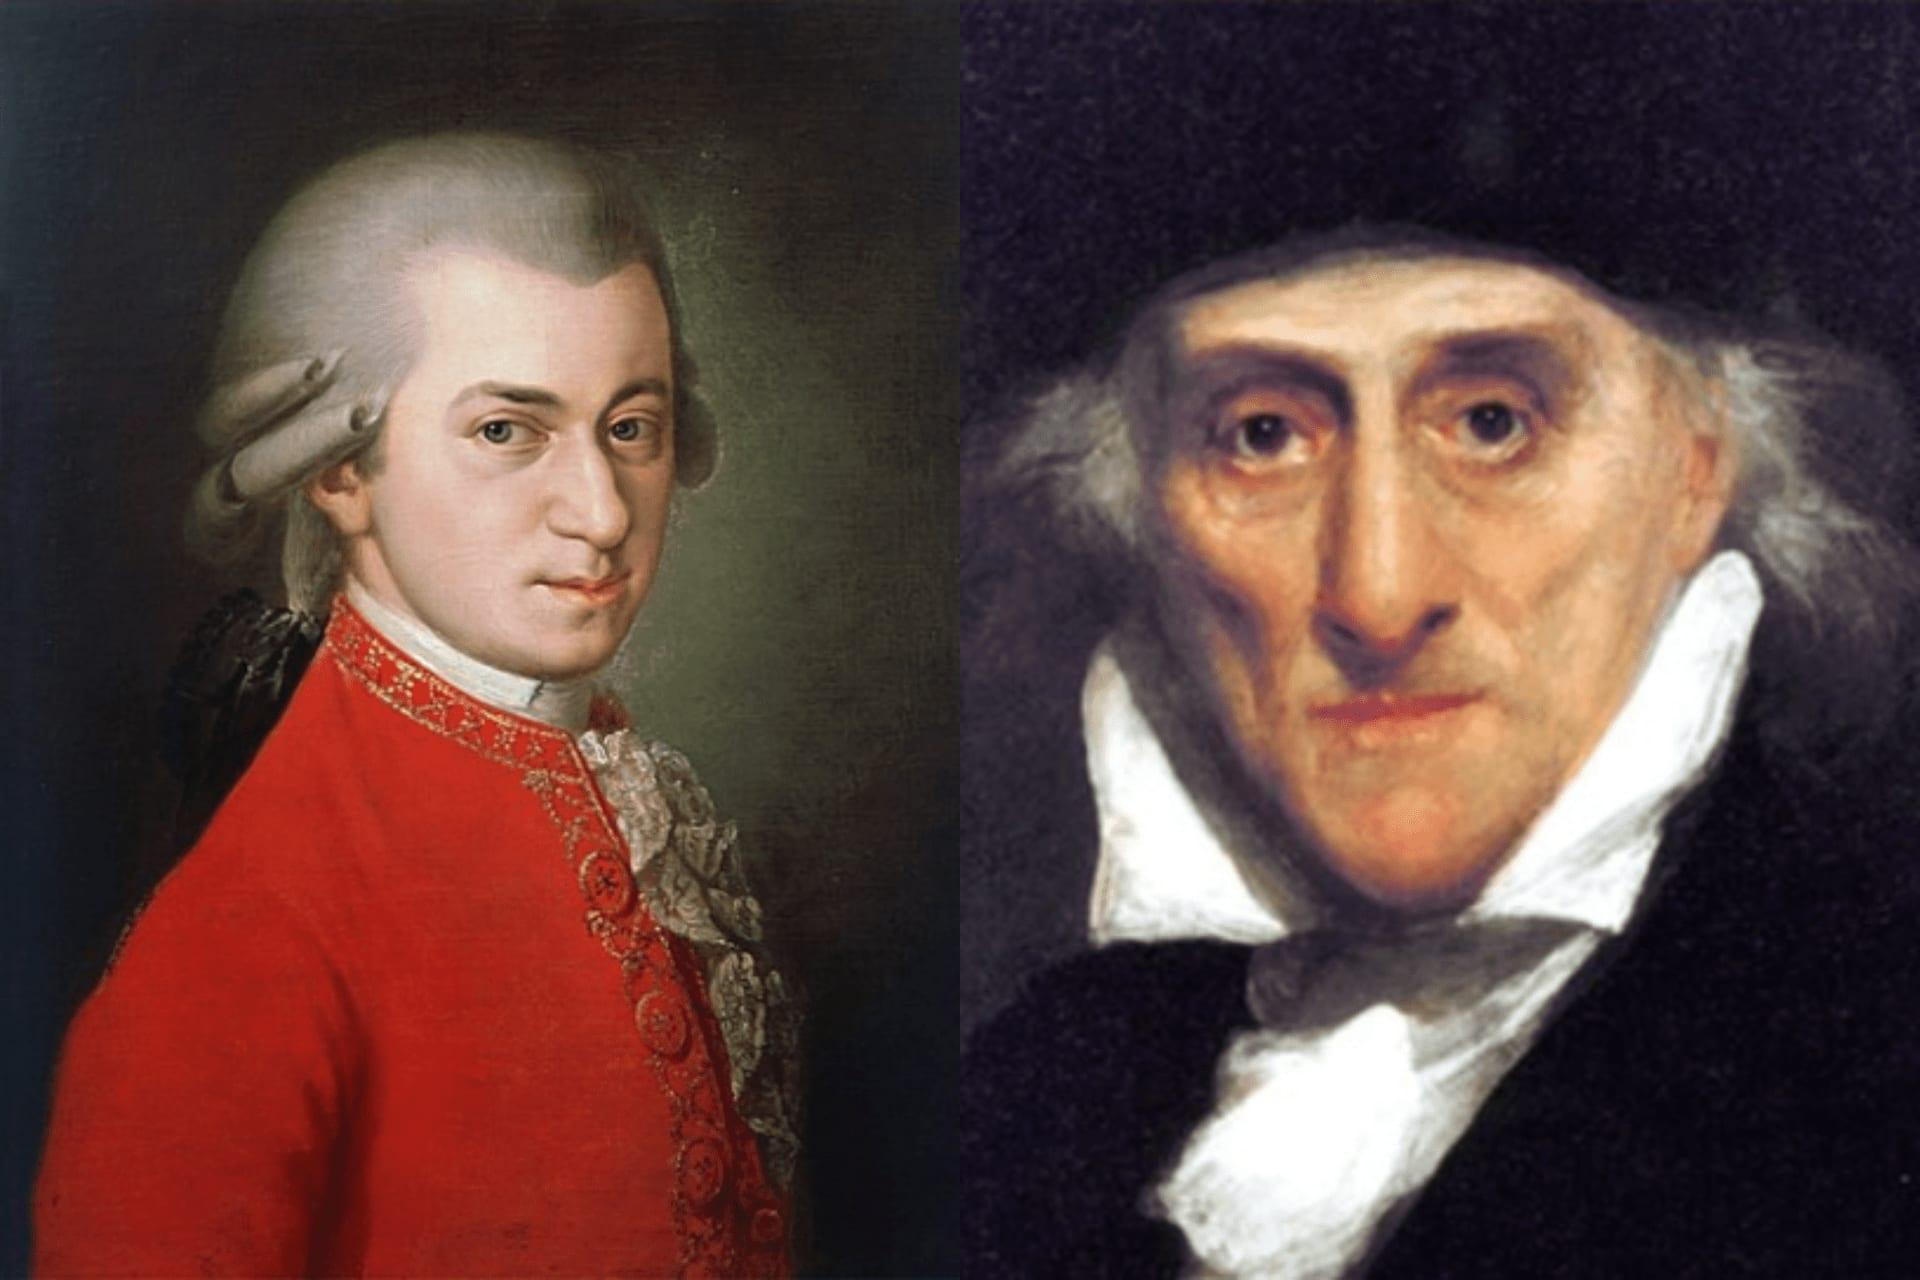 VEČER MOZARTA Triptih Mozarta -  Da Pontea